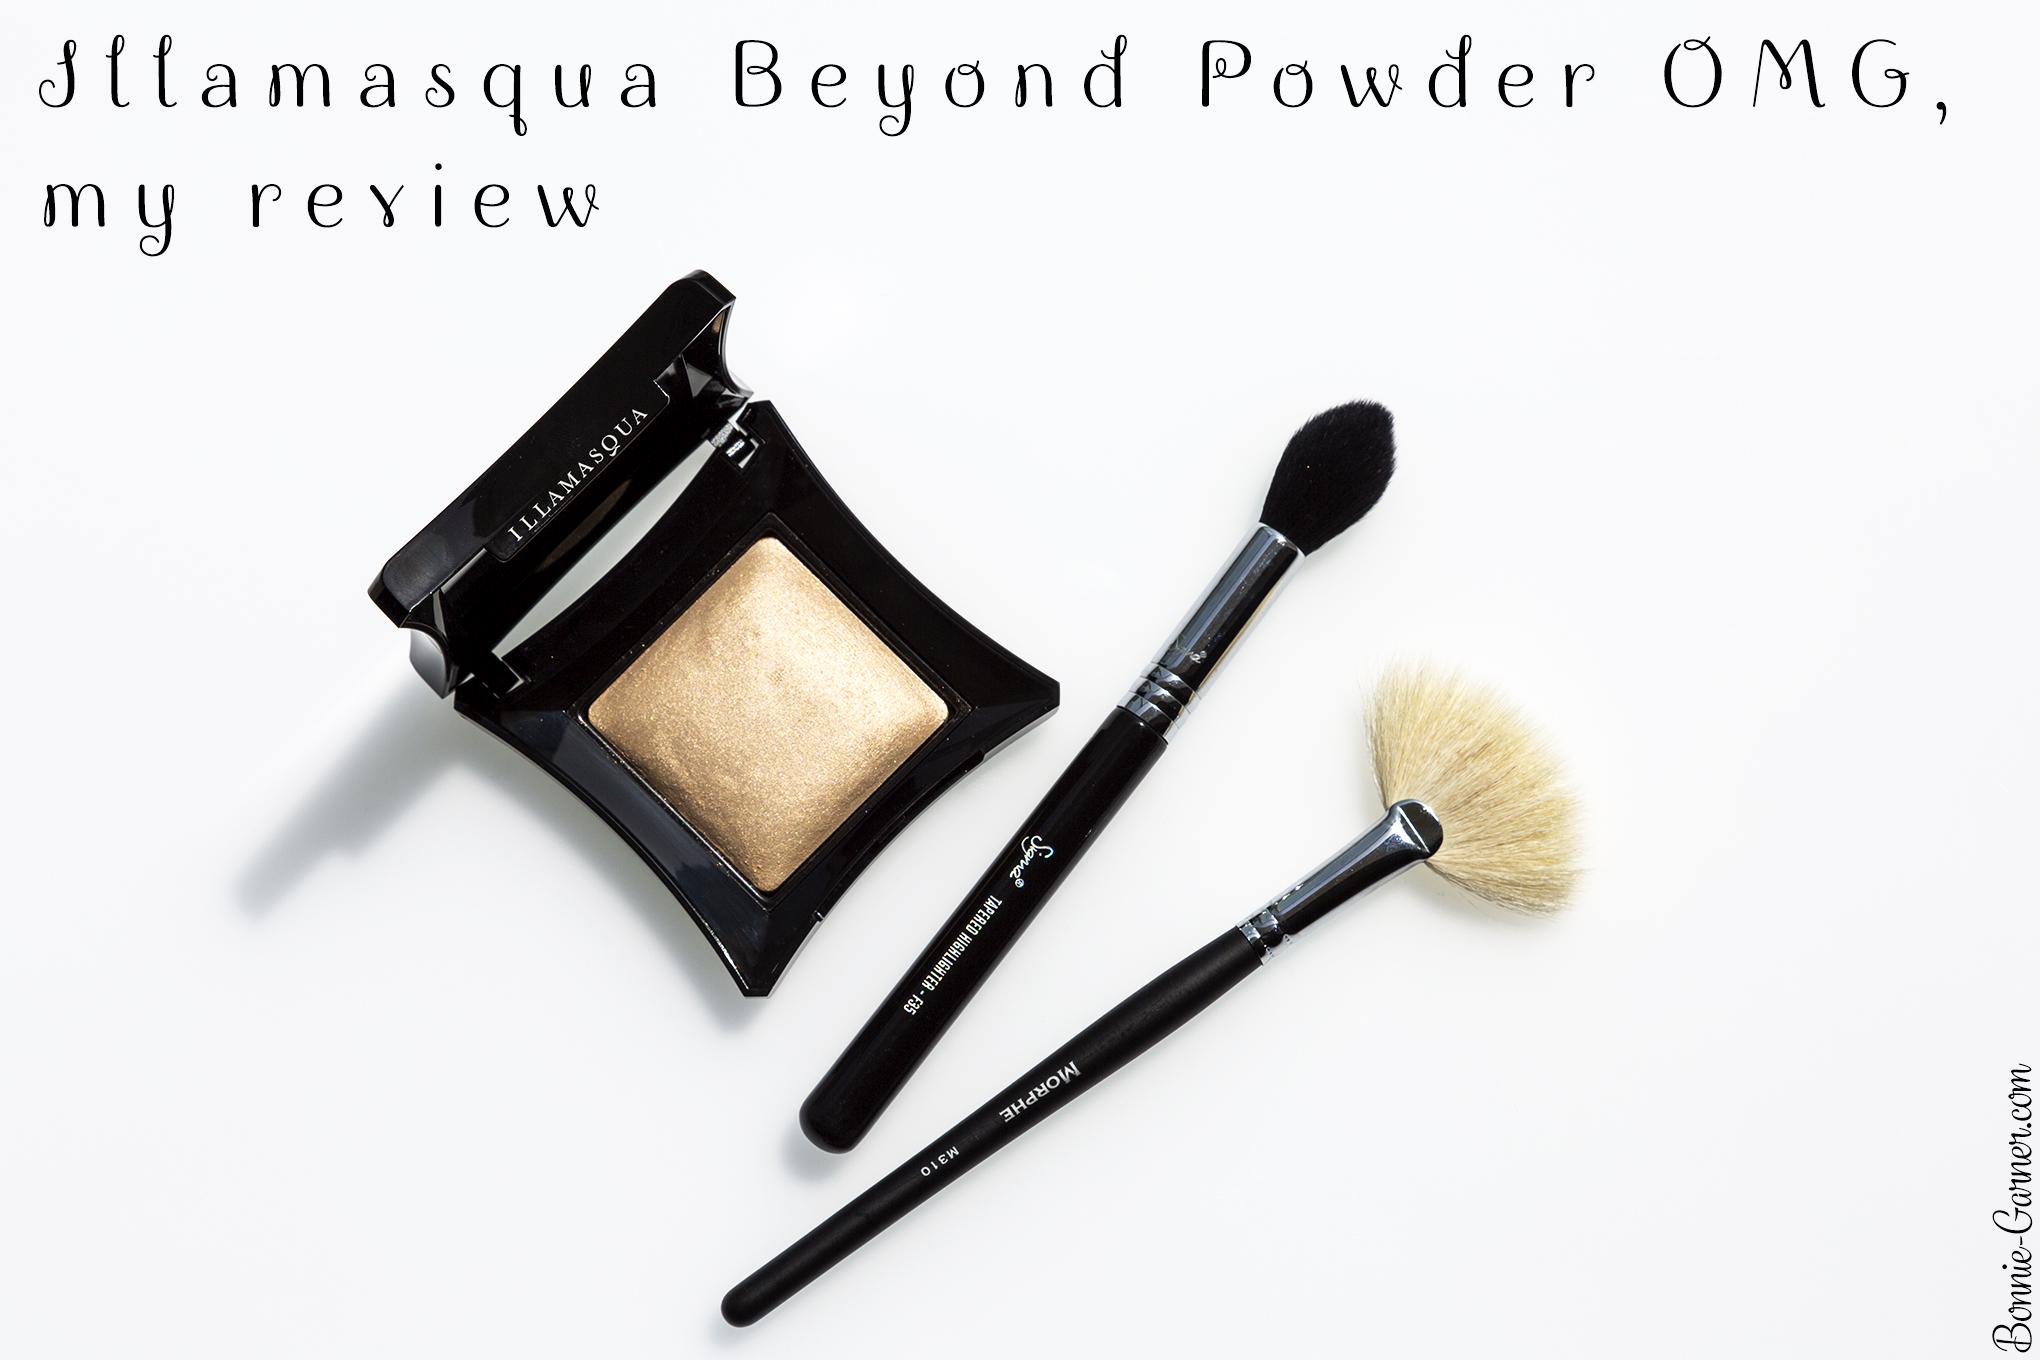 Anastasia Beverly Hills Eyeshadows: Bone, Fresh, Cream, Nude, Soft Peach swatches